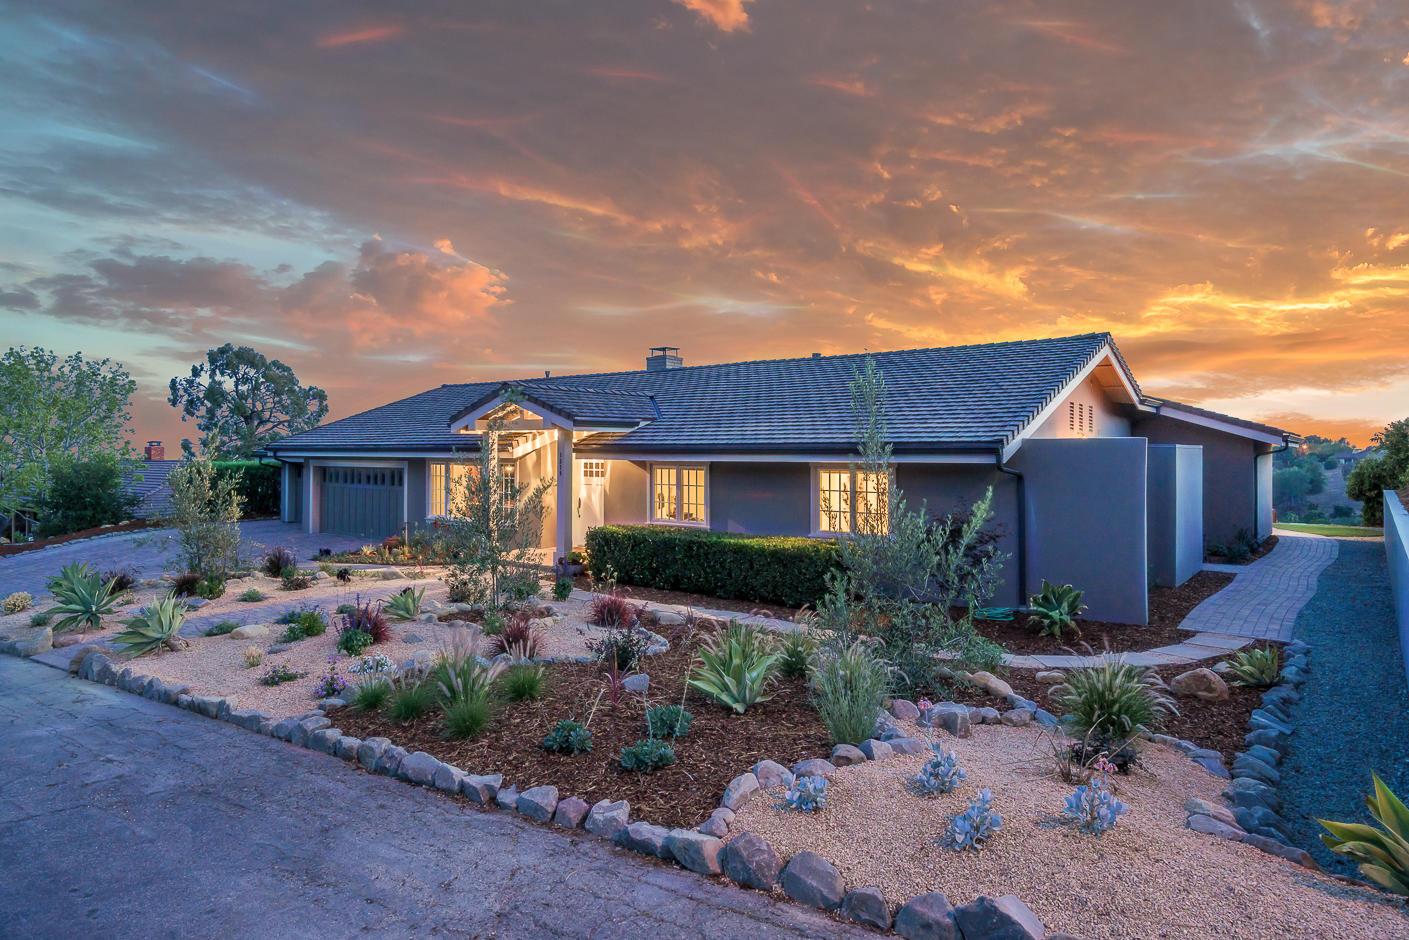 Property photo for 1379 Camino Meleno Santa Barbara, California 93111 - 18-2939